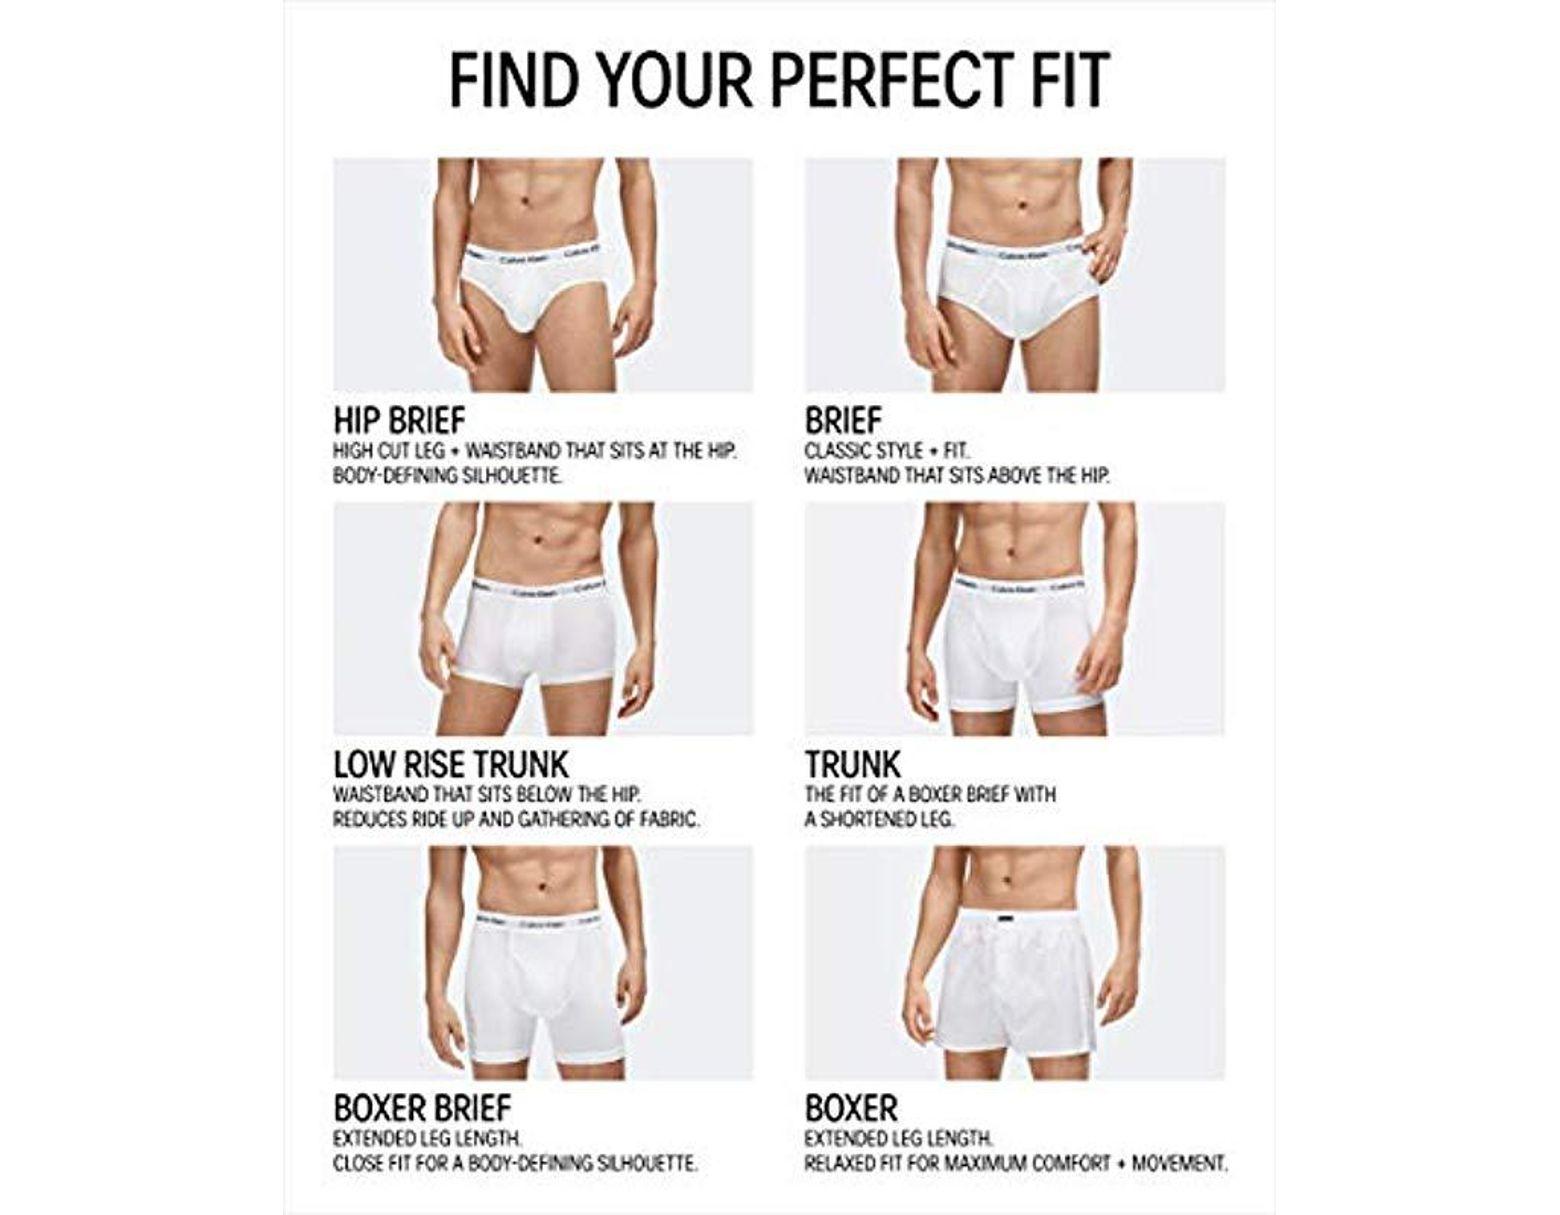 e27cd6d9cb85de Calvin Klein The Pride Edit 5-pack Jock Strap for Men - Lyst